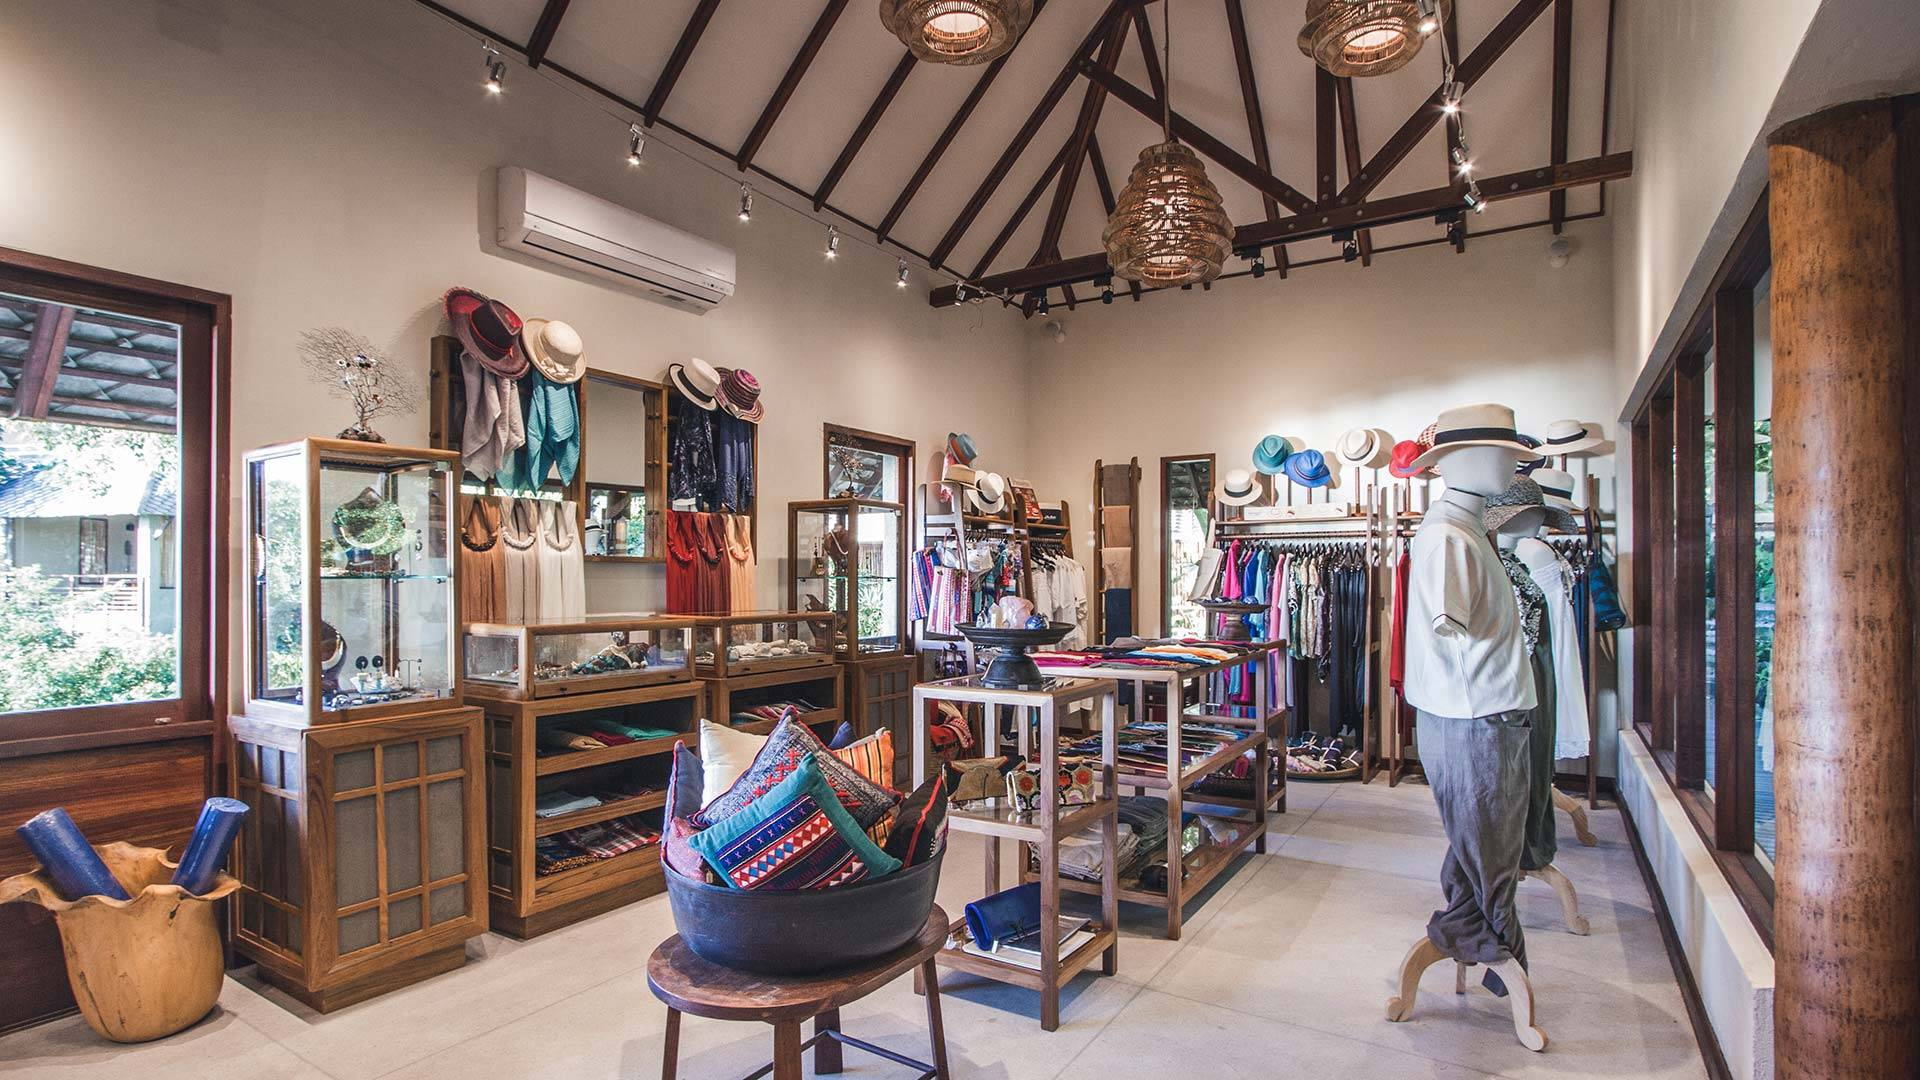 Boutique Gallery in Koh Samui Thailand